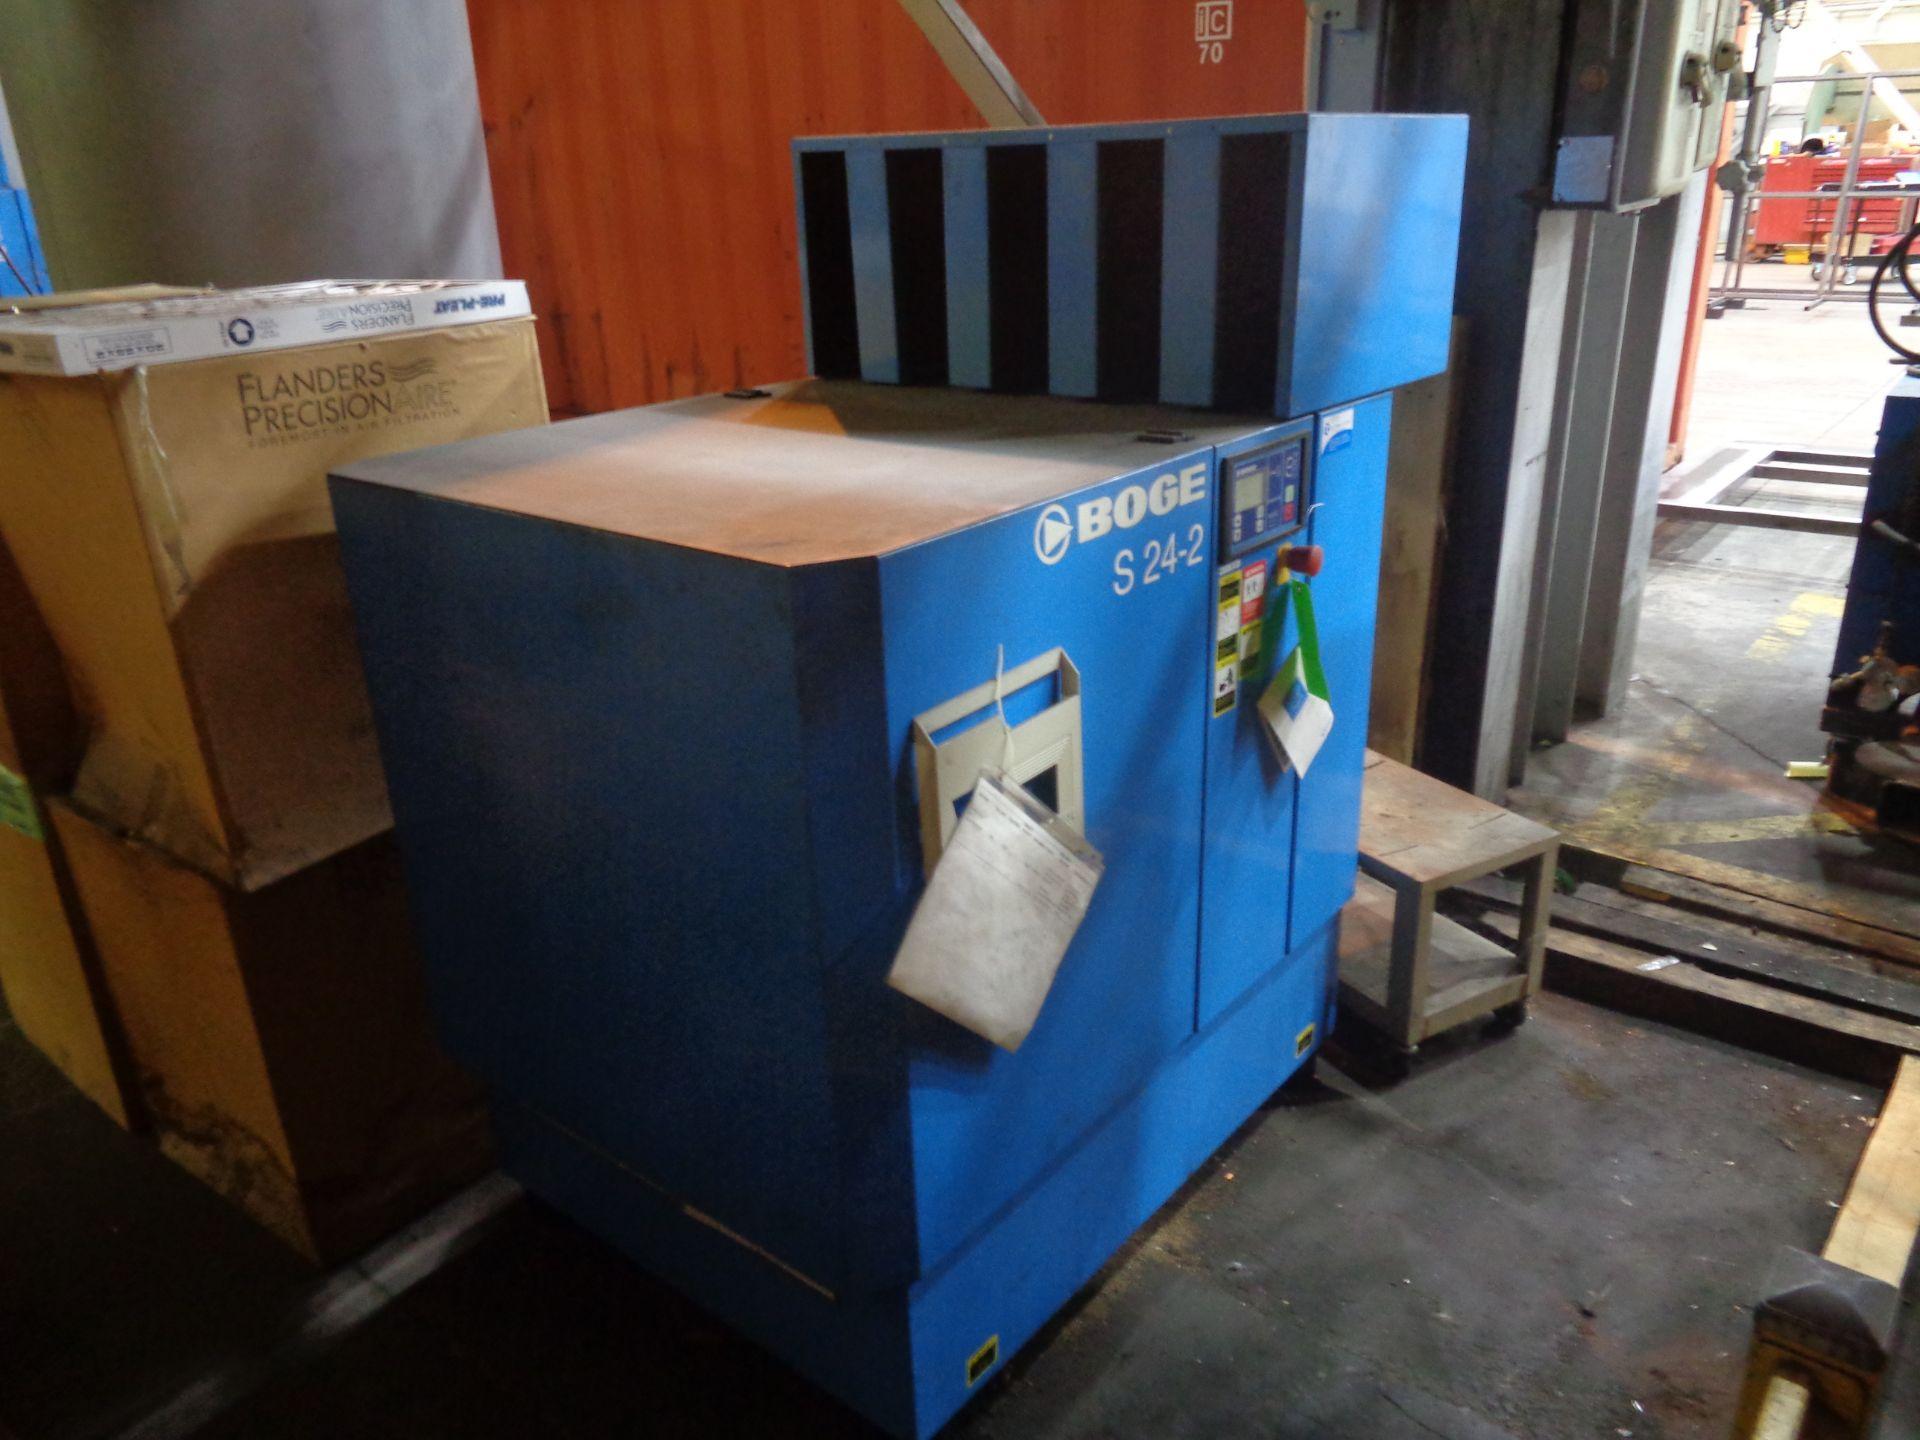 Boge Compressor and Tank - Image 3 of 5